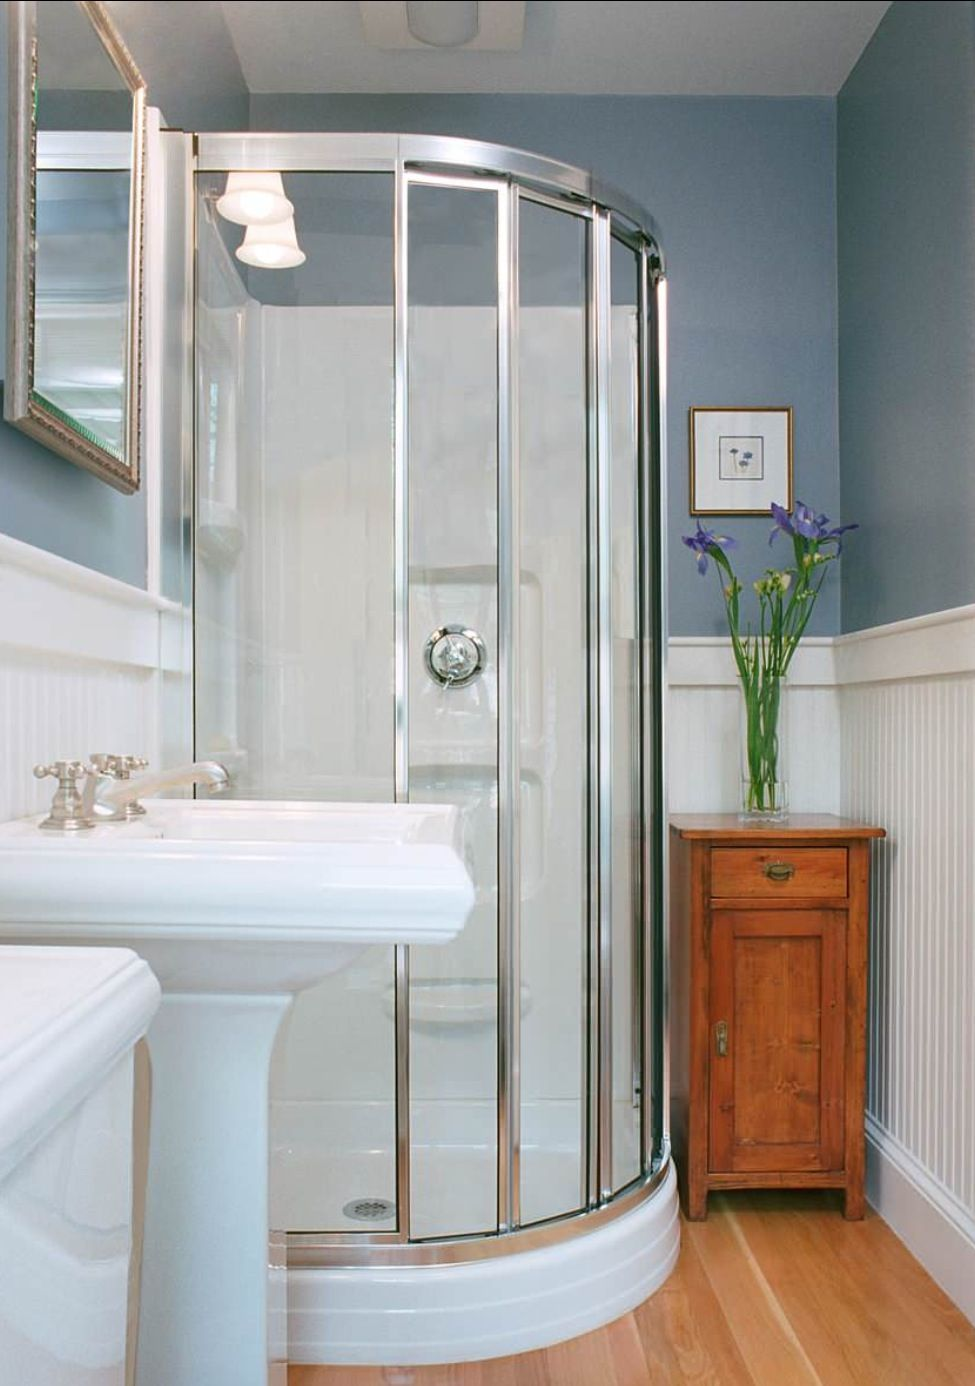 Simple bathroom. wood floor. prefab shower, but it looks ... on Nice Bathroom Designs For Small Spaces  id=70917